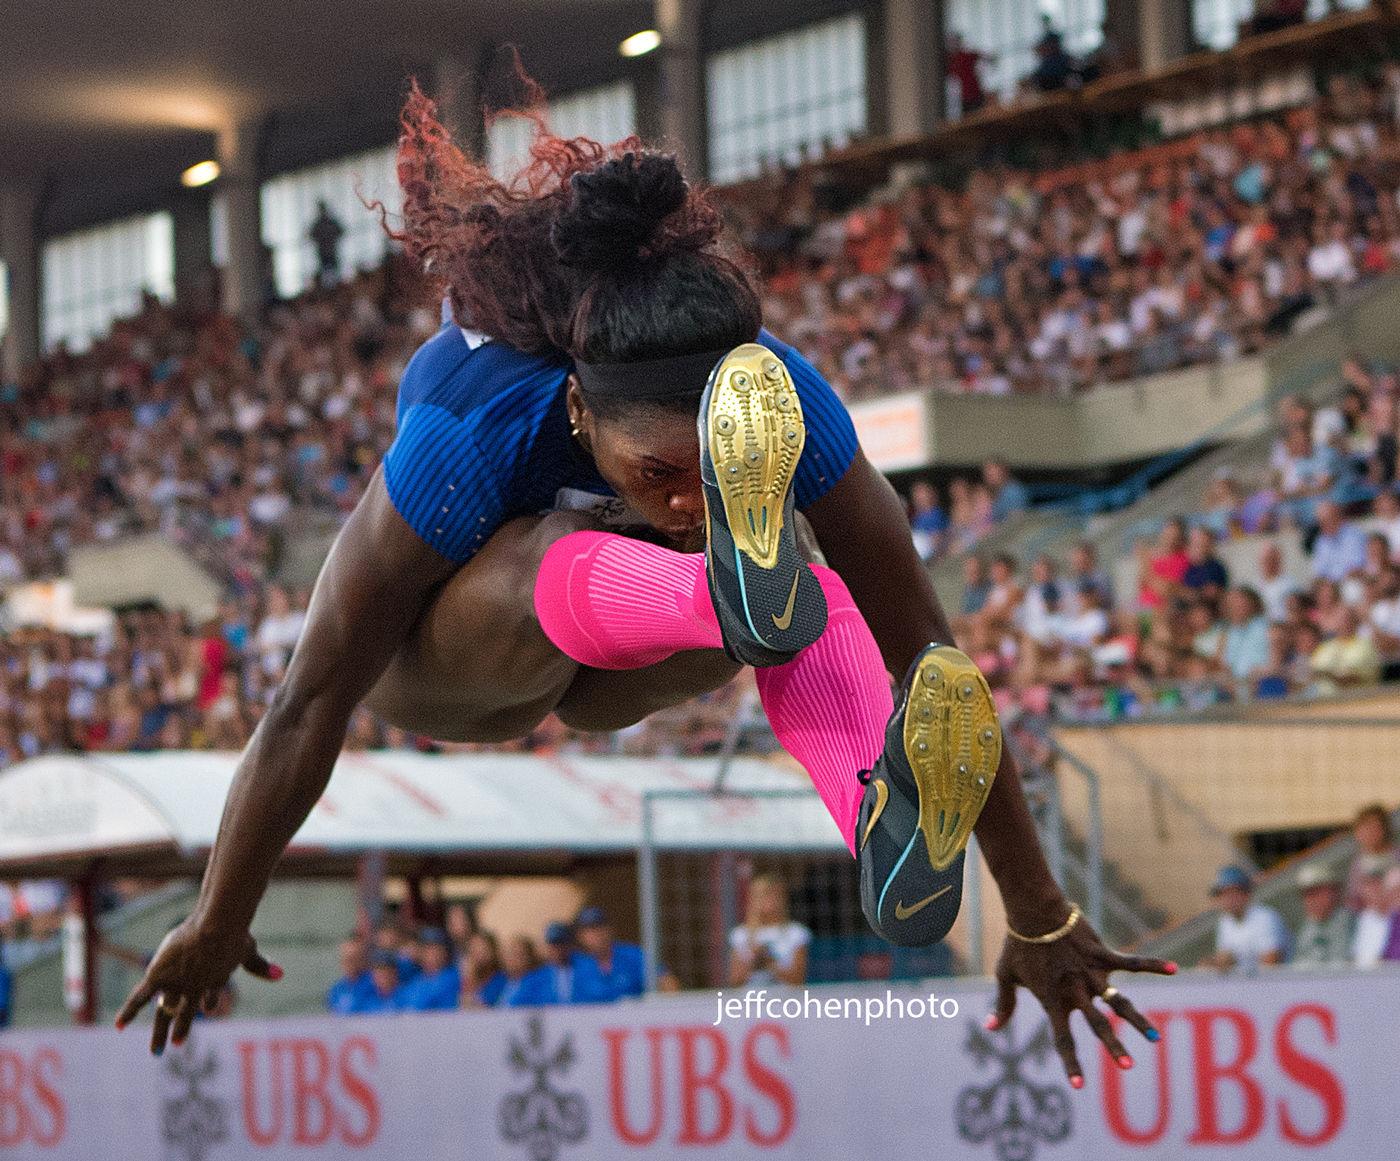 1r2016_athletissima_lausanne_imbarguen_tjw_jeff_cohen_photo_65web.jpg